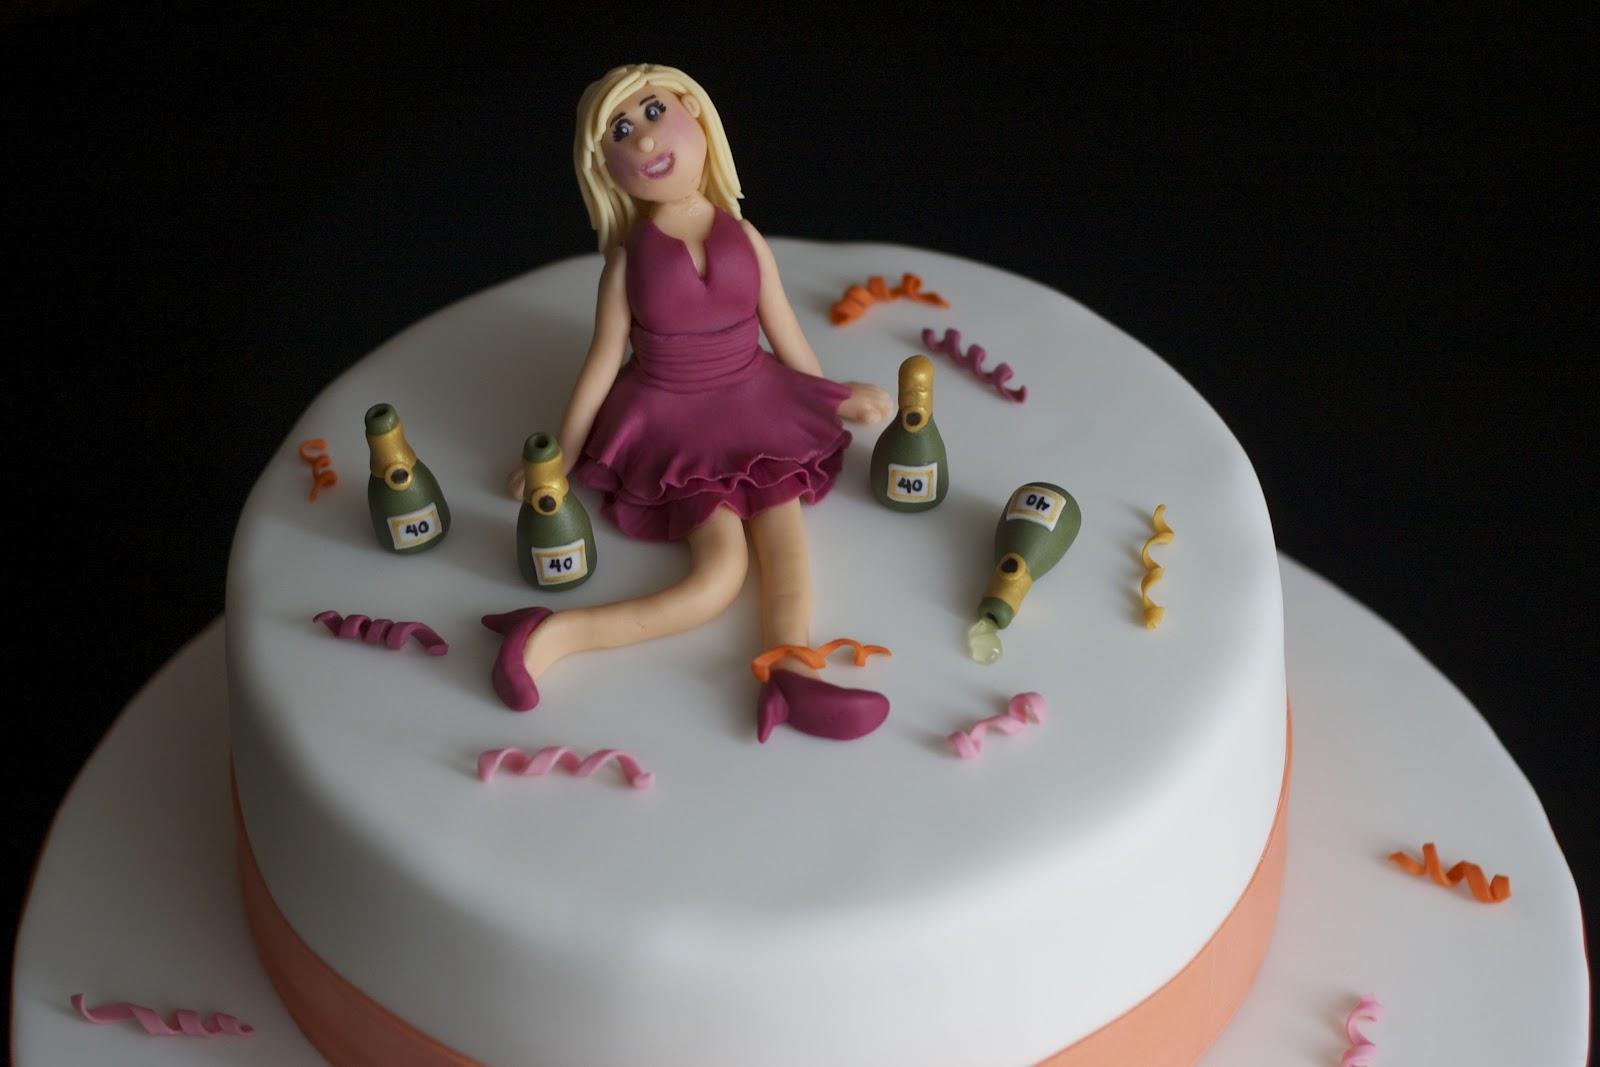 Pin 40th Birthday Quotes Happy Cakes Kootationcom Cake on ...